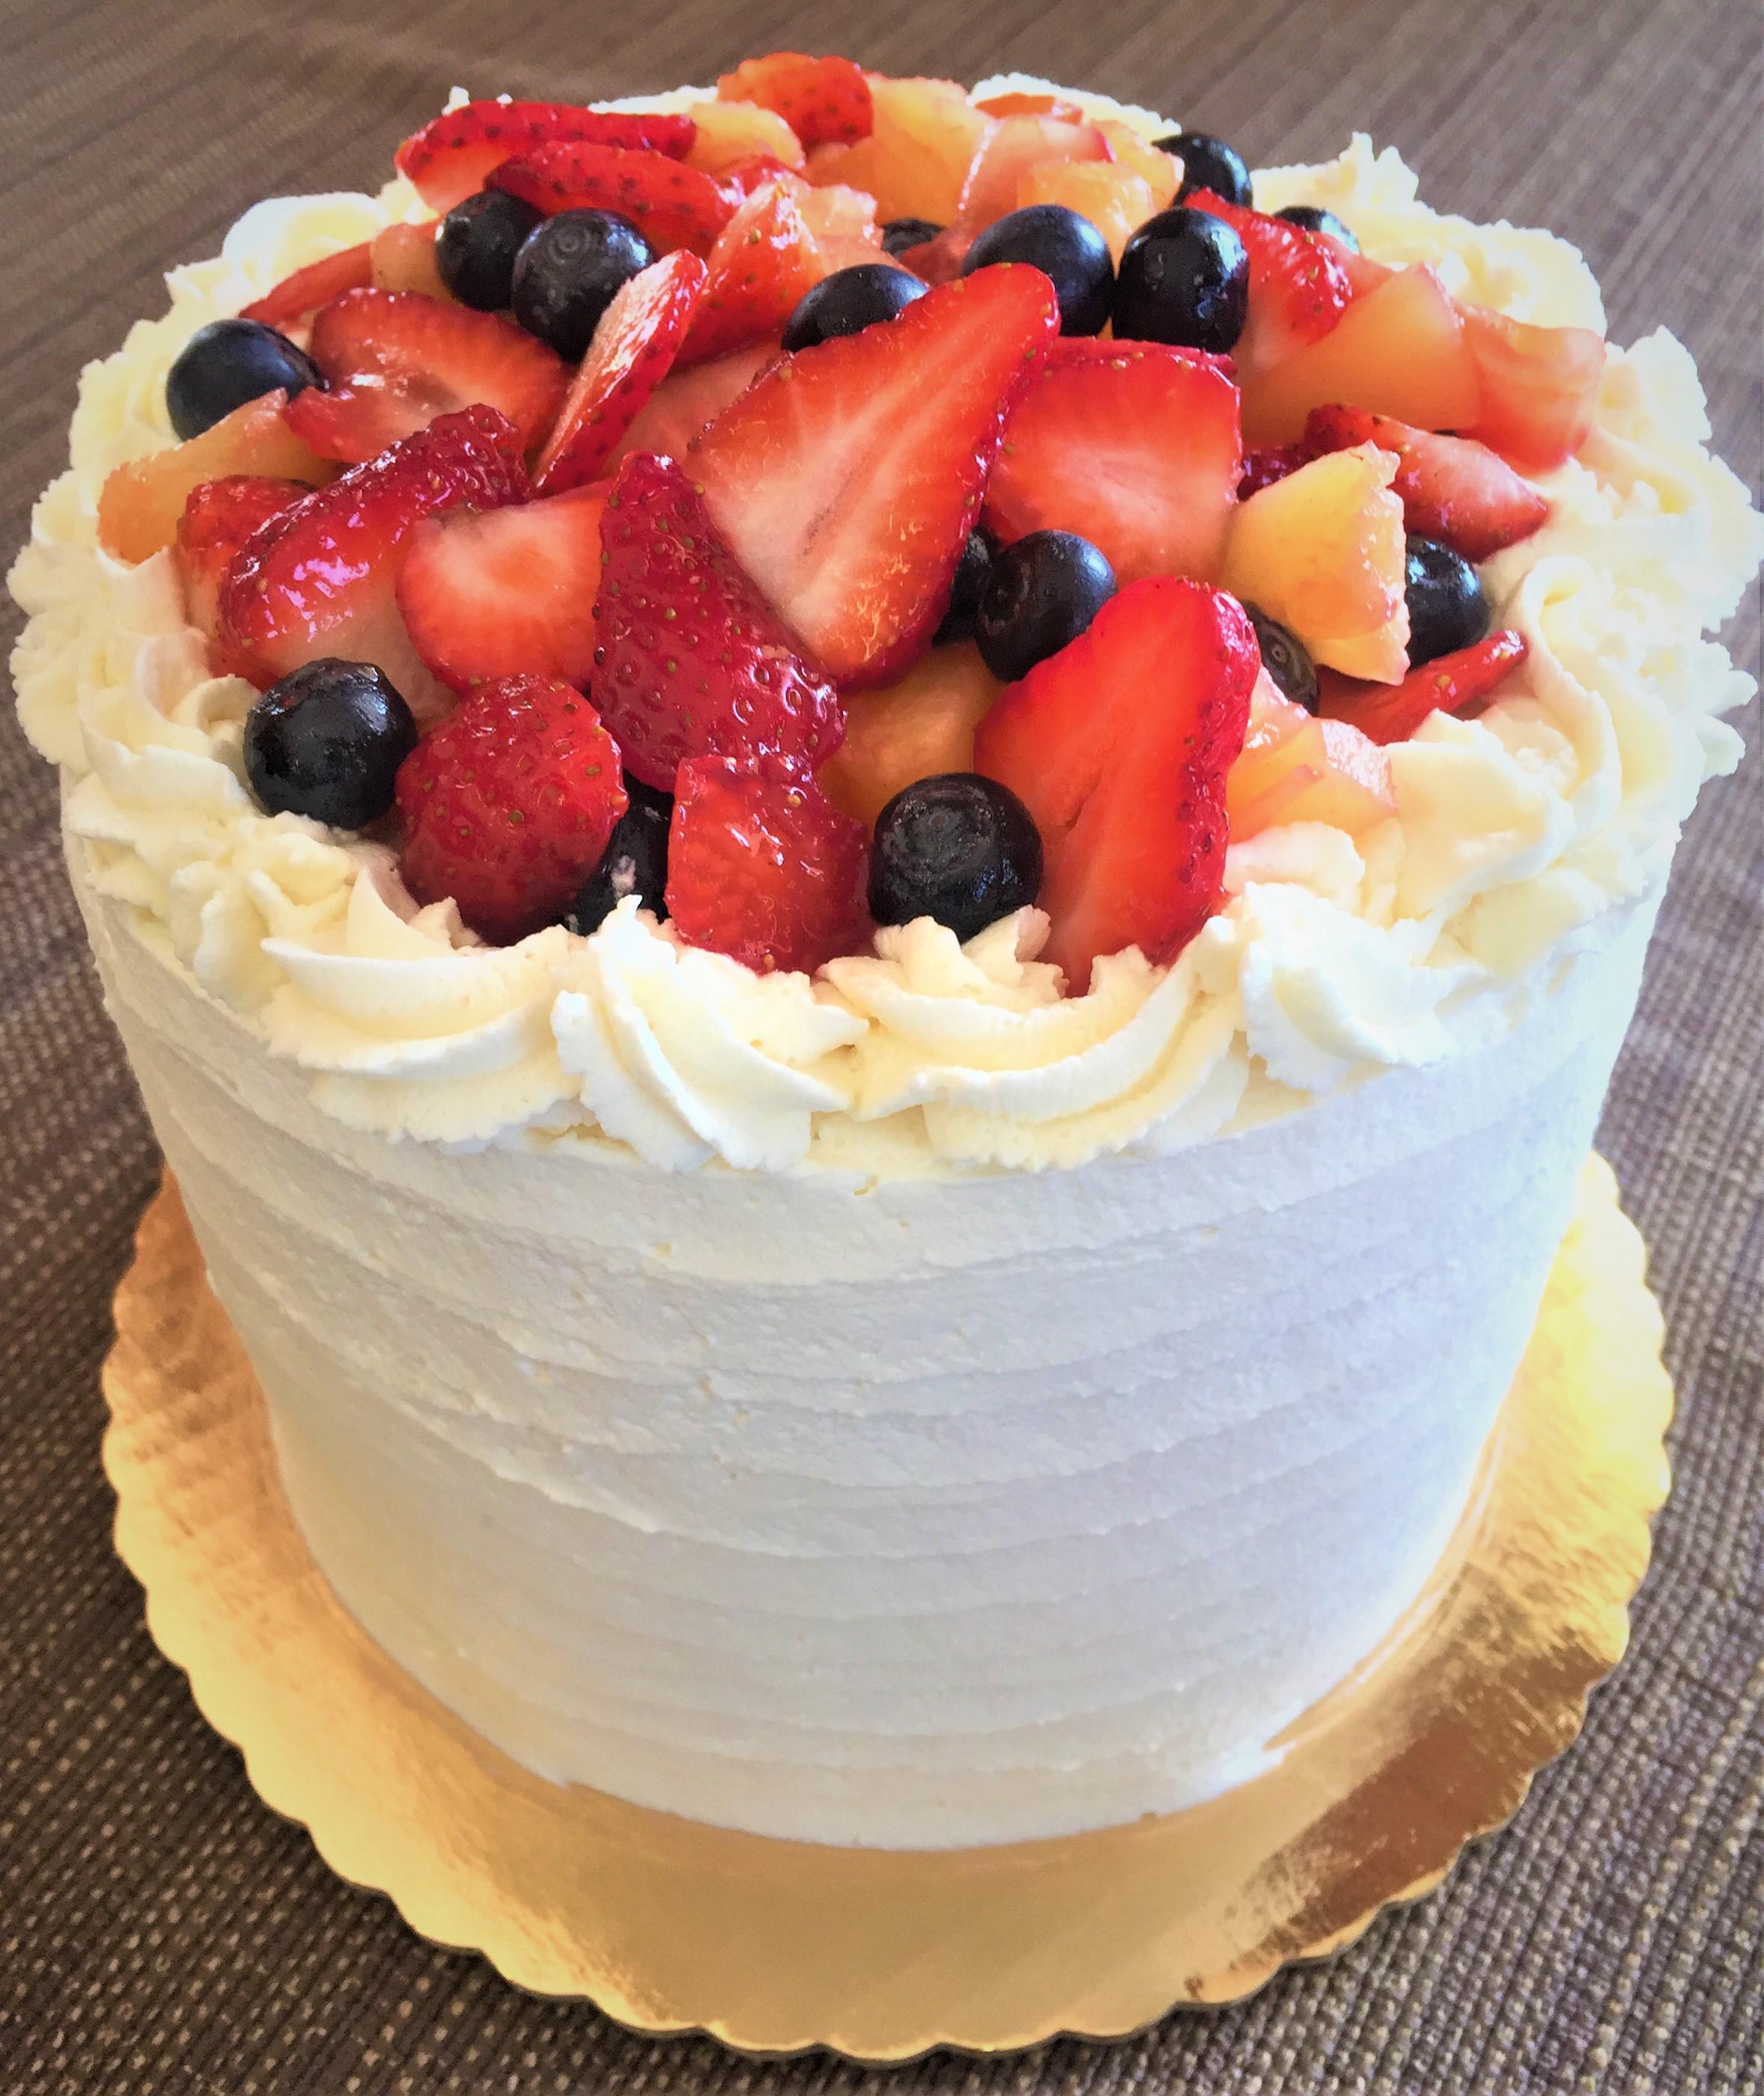 2019 Gateaux Bakery & Cafe Fresh Strawberry & Whipped Cream Vanilla Cake.jpg